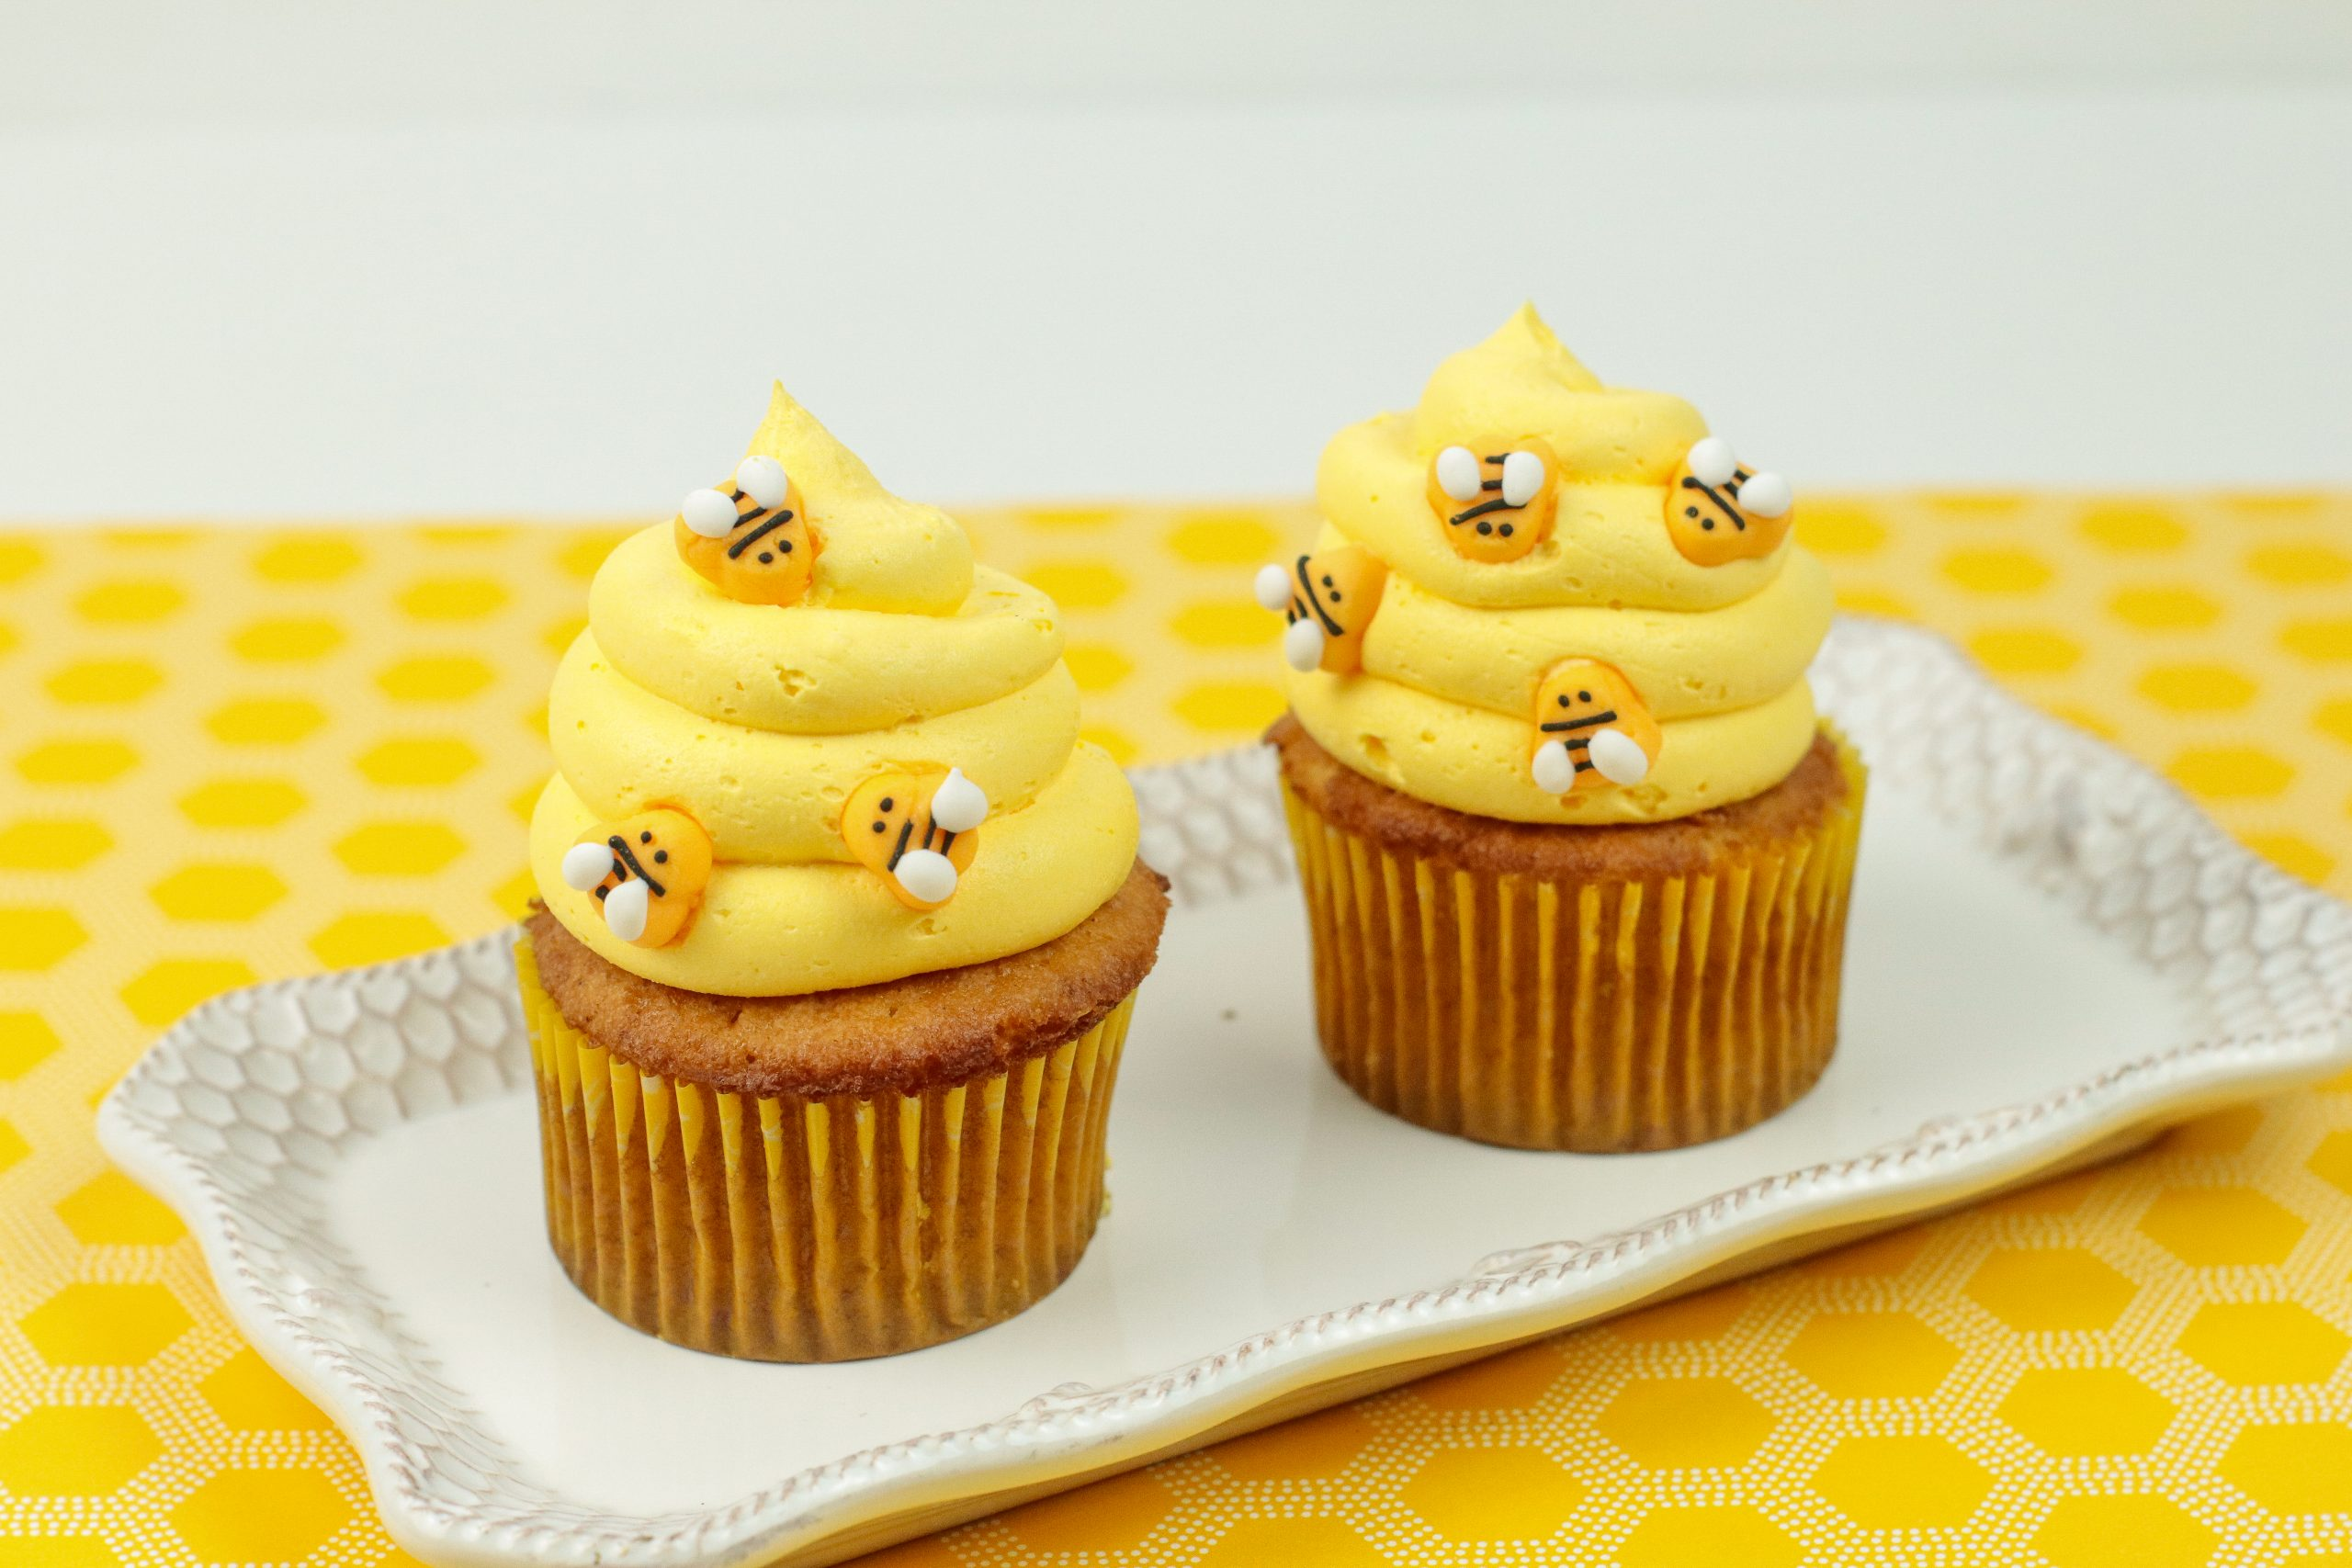 Honey Cinnamon Bumblebee Cupcakes on a platter.